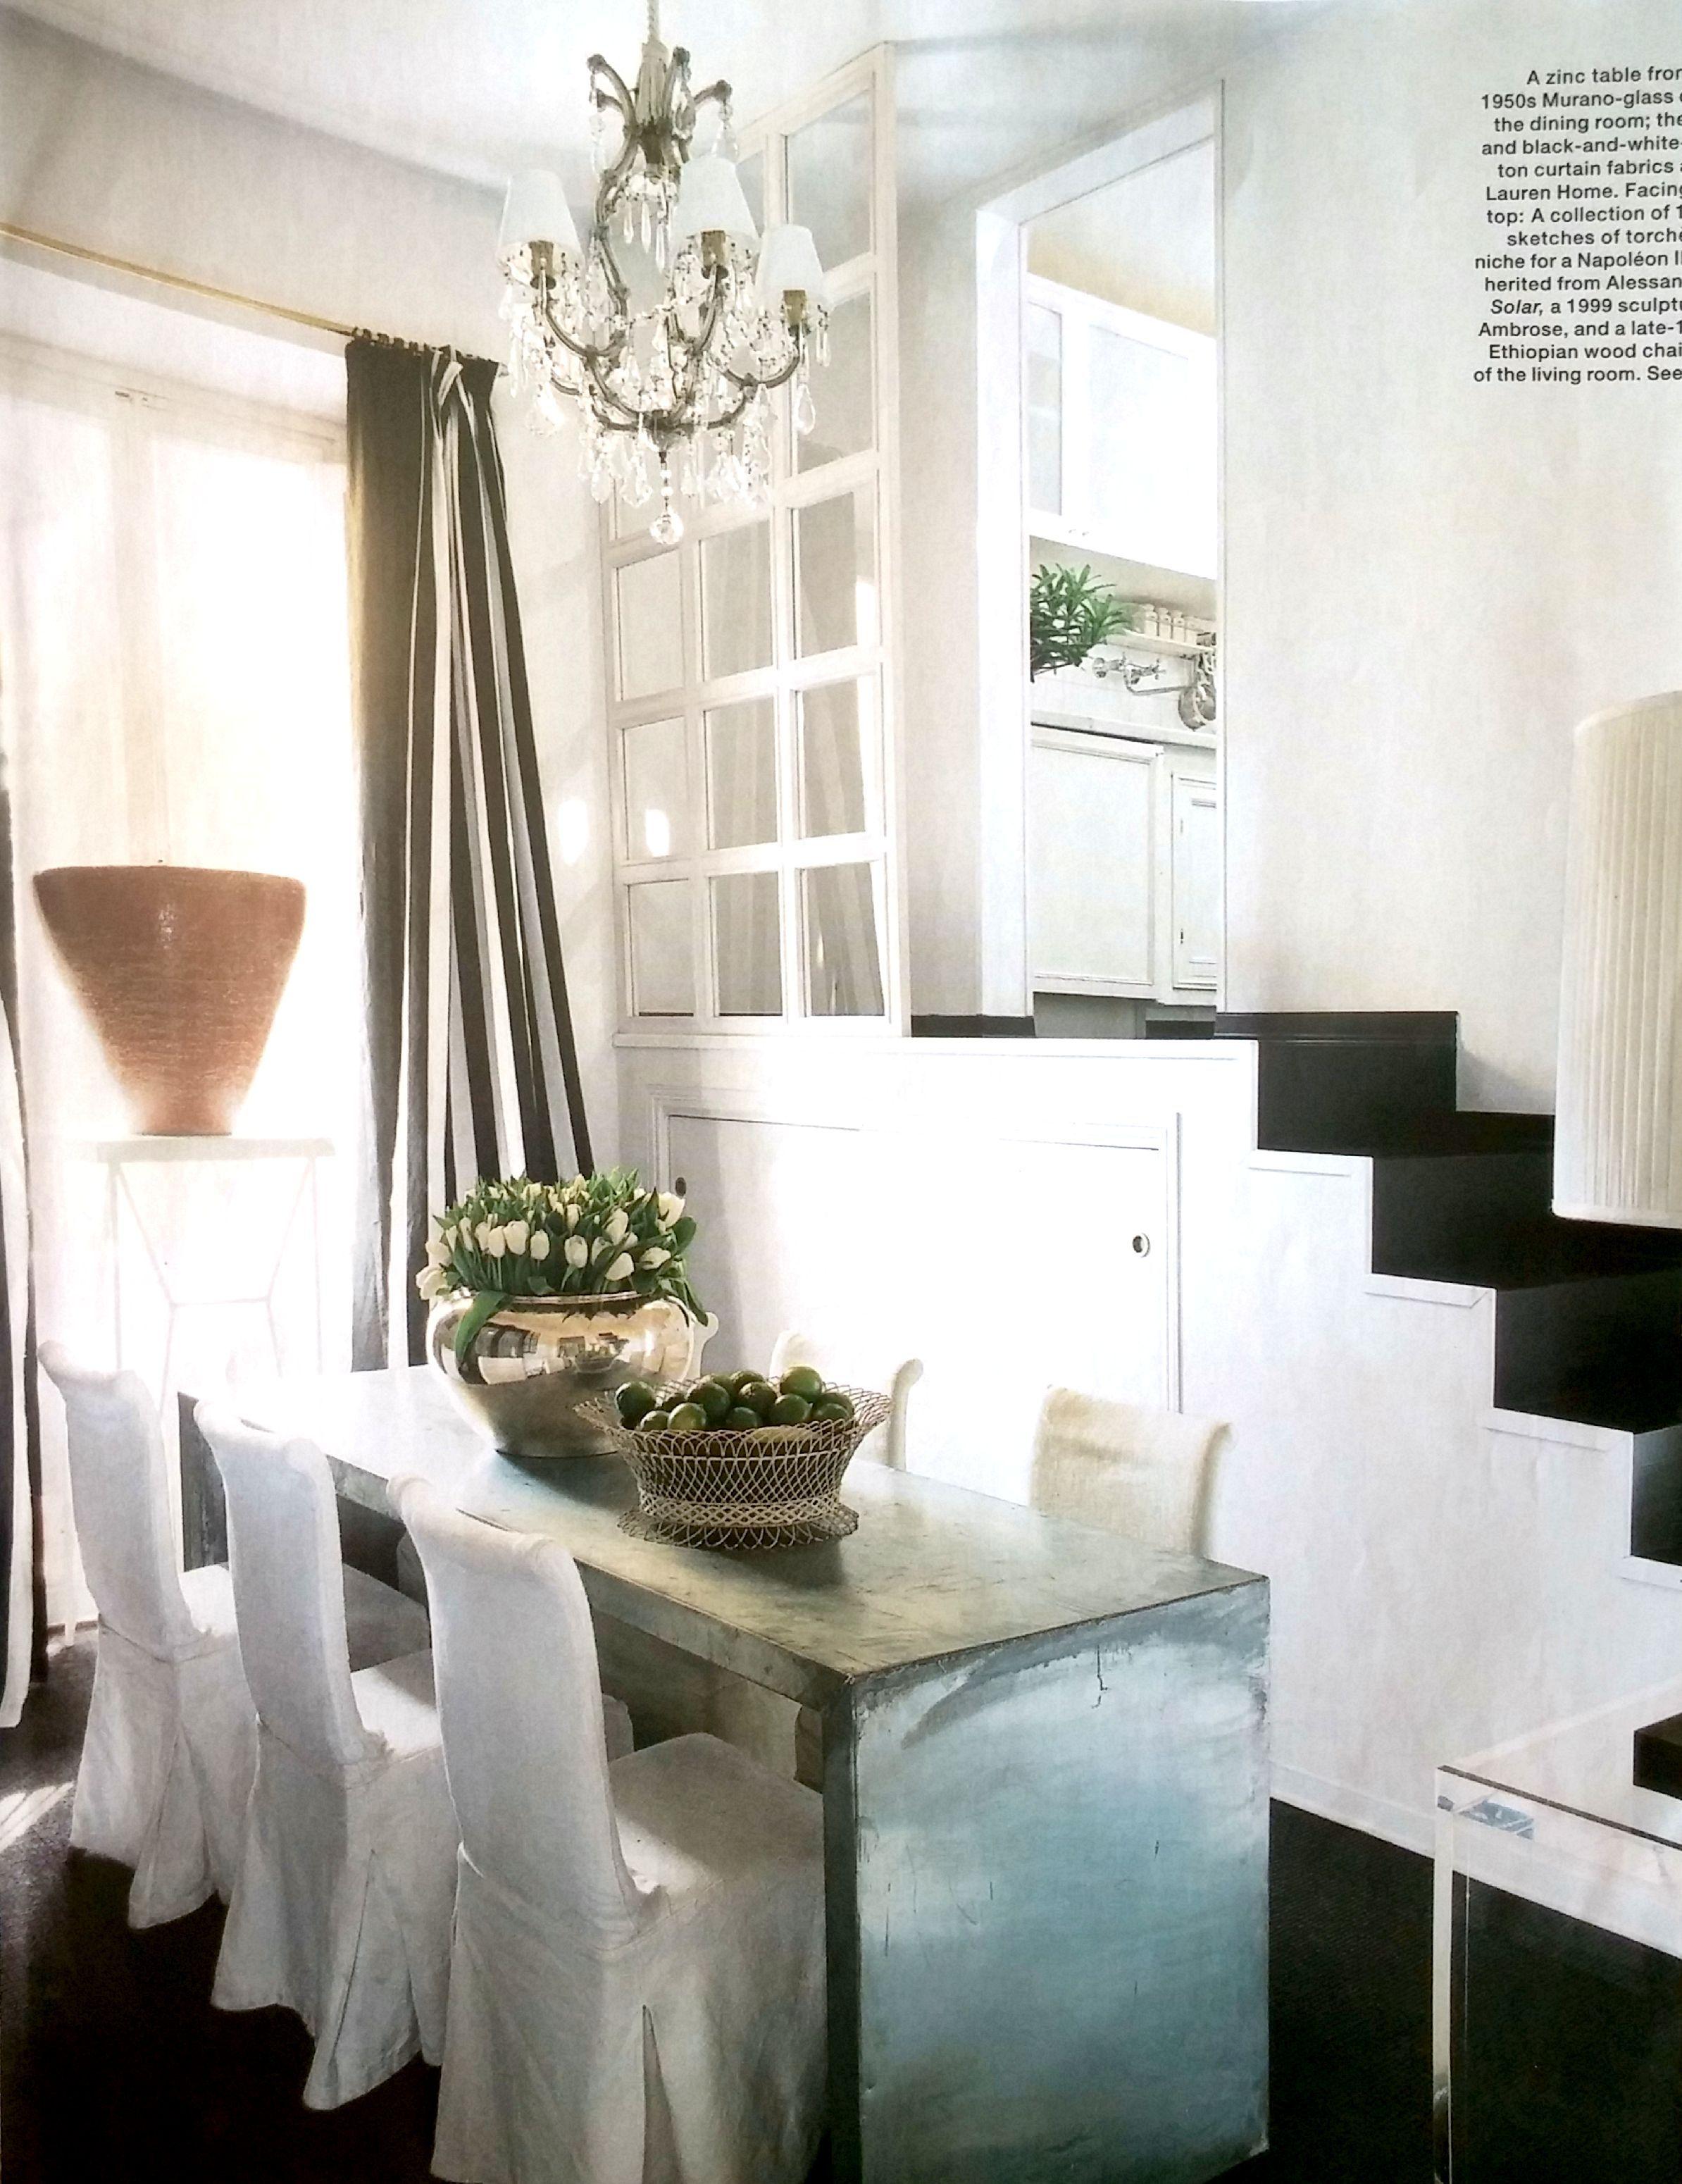 Pin by Michelle Collette Stanton on Interior design